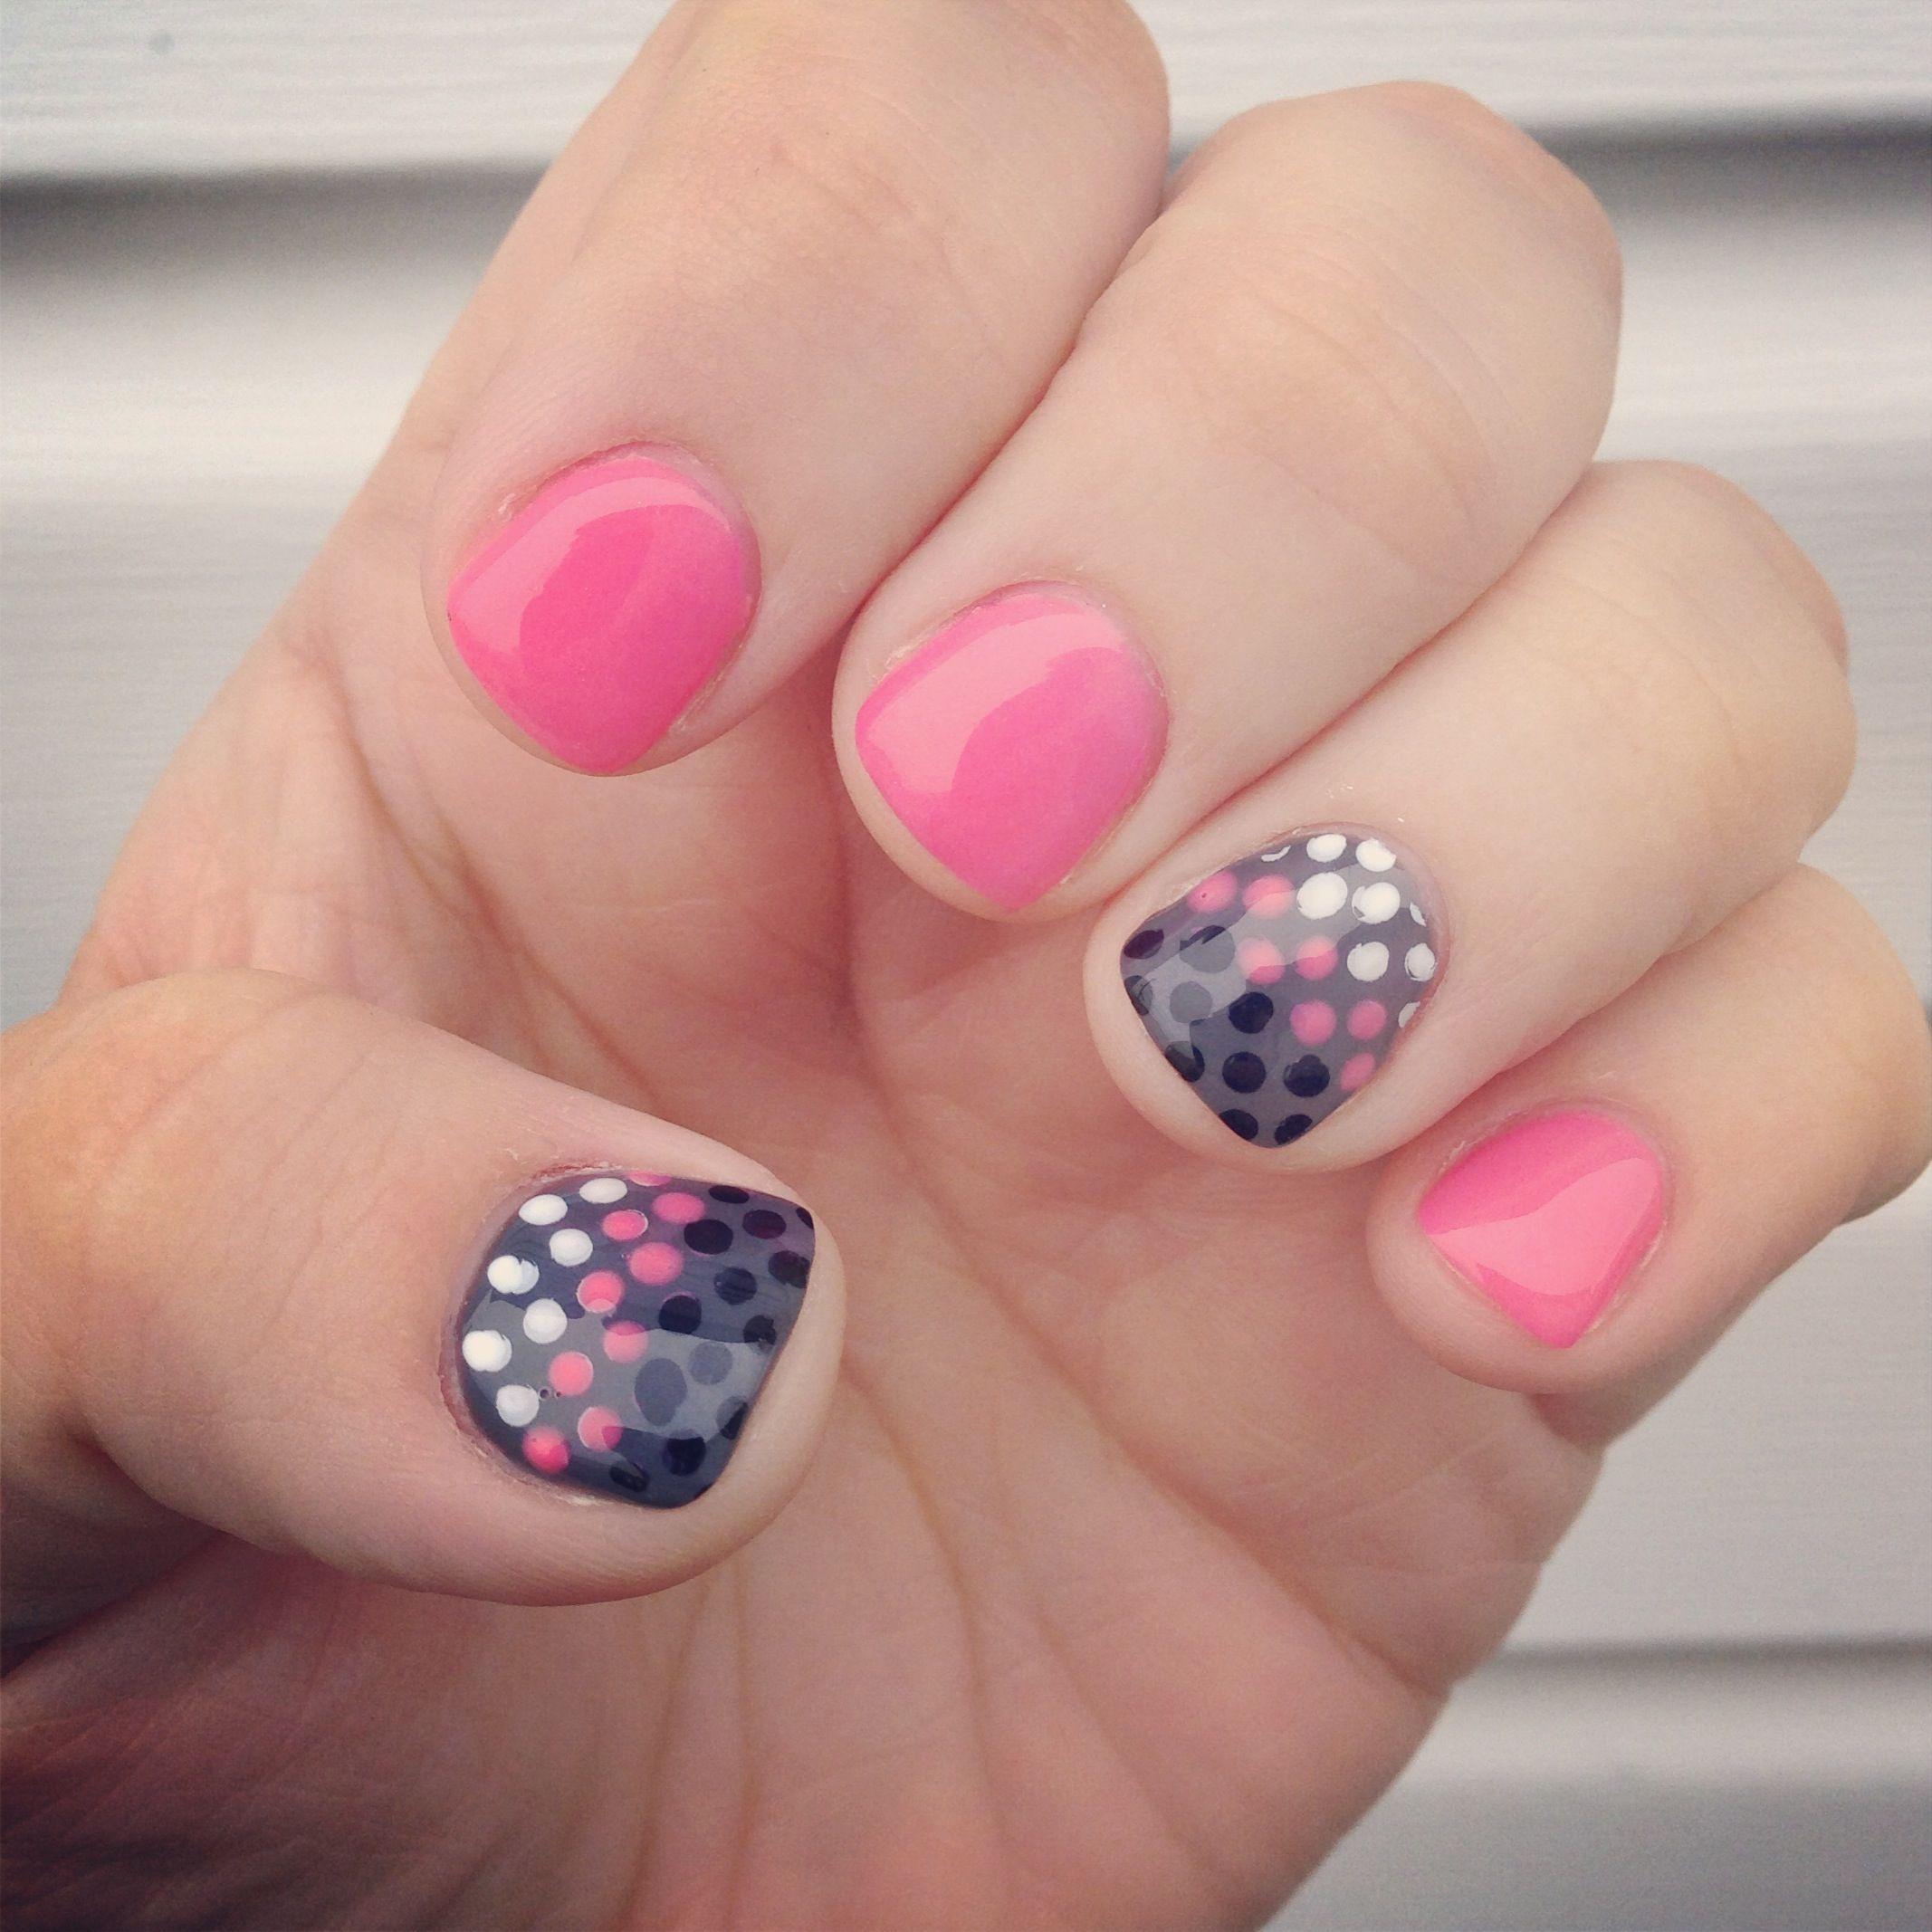 Gel Polish Designs: Pink And Grey Polka Dots Gel Manicure